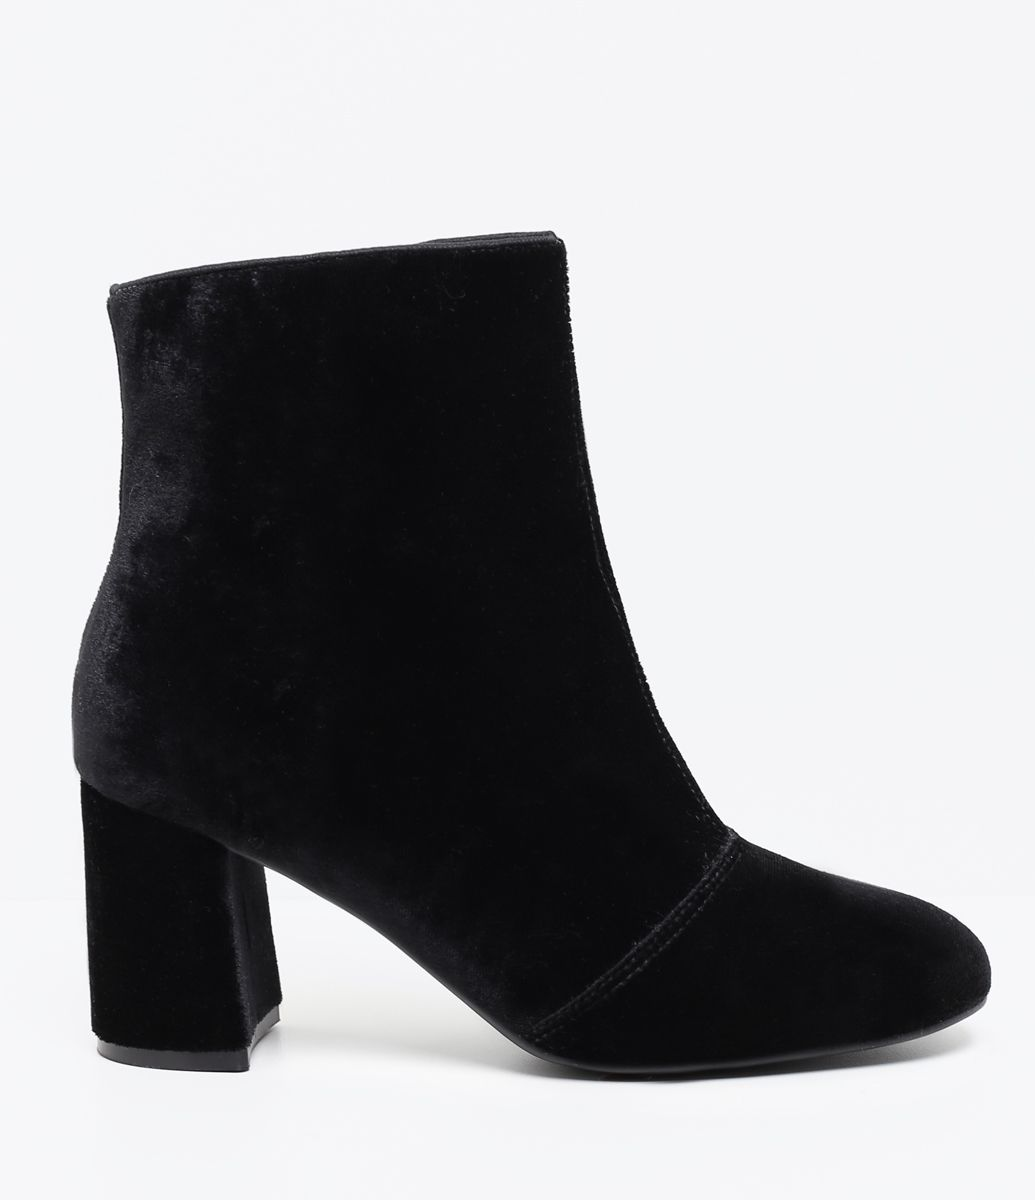 Boots Bota Fashion Cano baixo Heels Ref. 17 4405